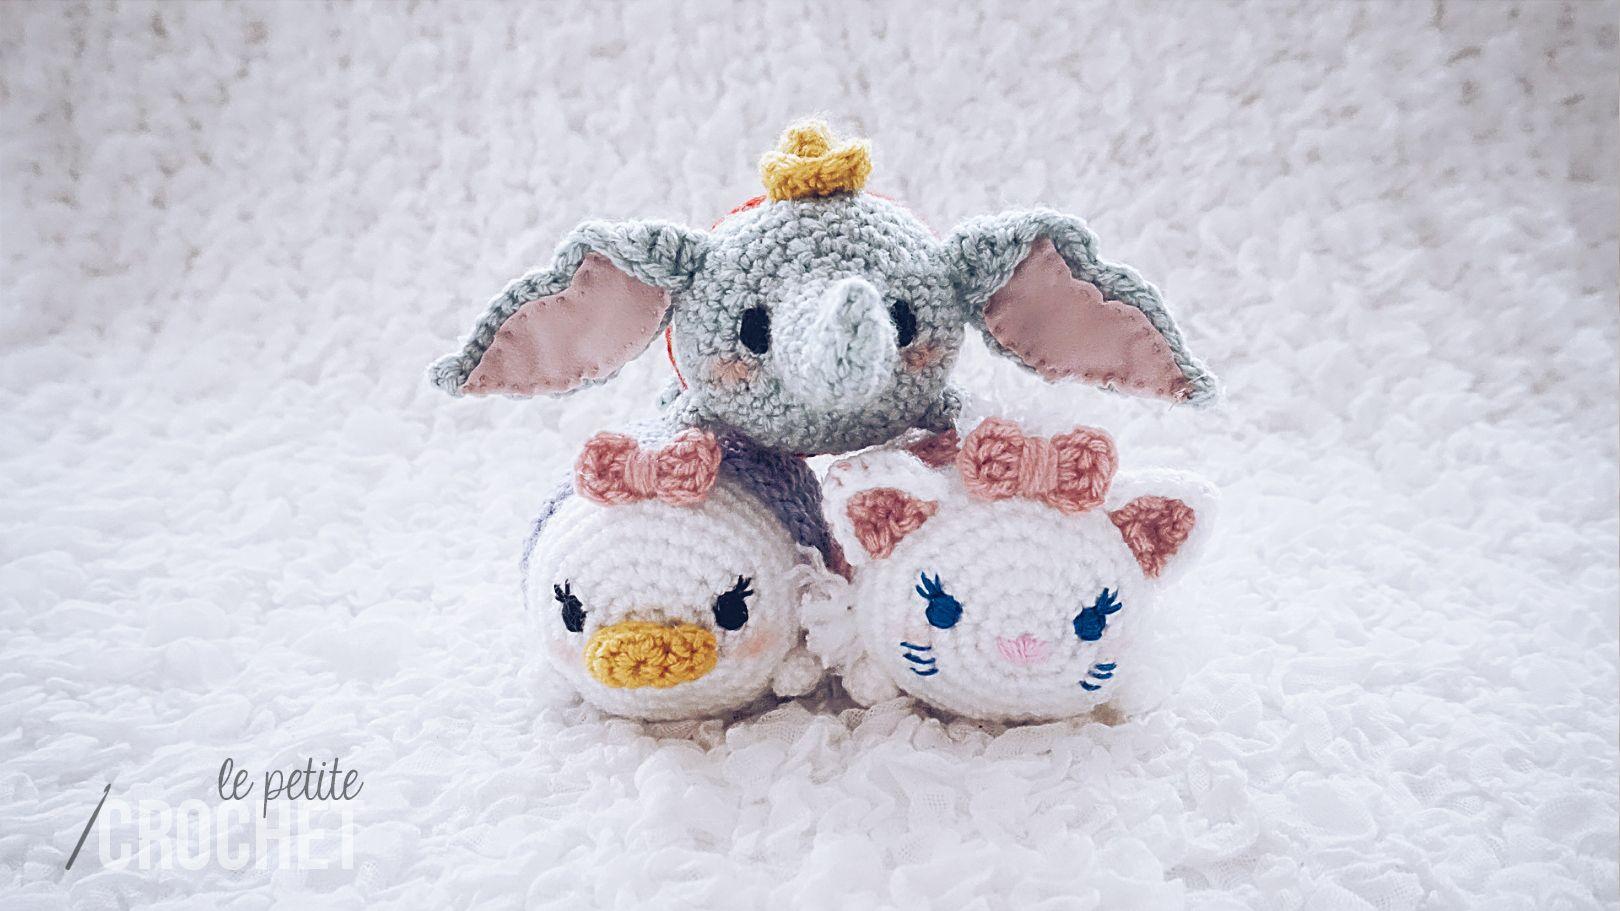 Tsum Tsum Amigurumi Pattern Free : Disney tsum tsum amigurumi crochet featuring dumbo daisy duck